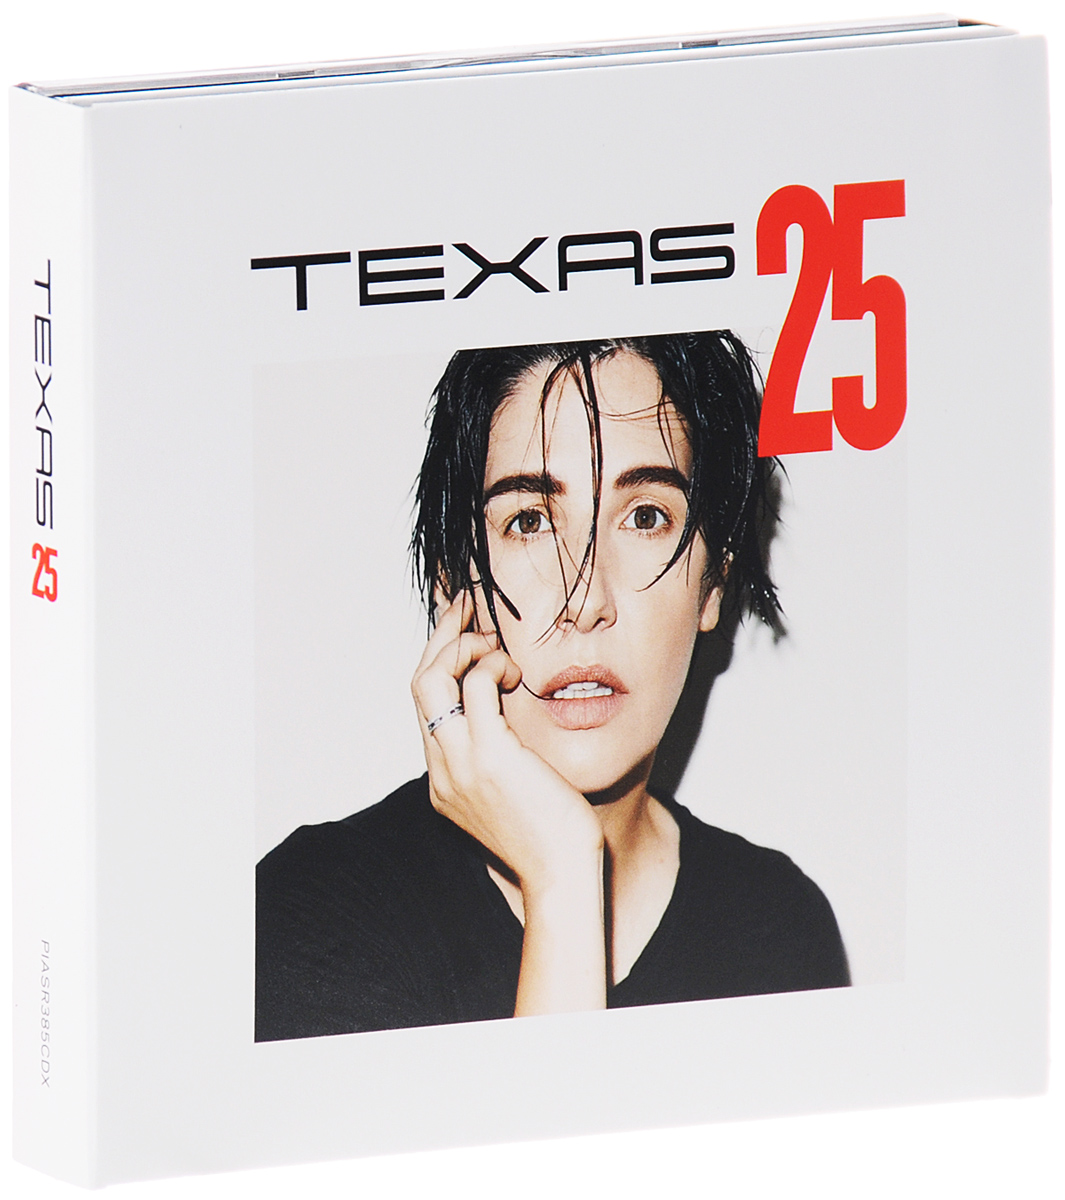 Texas Texas. Texas 25 (2 CD) texas texas texas 25